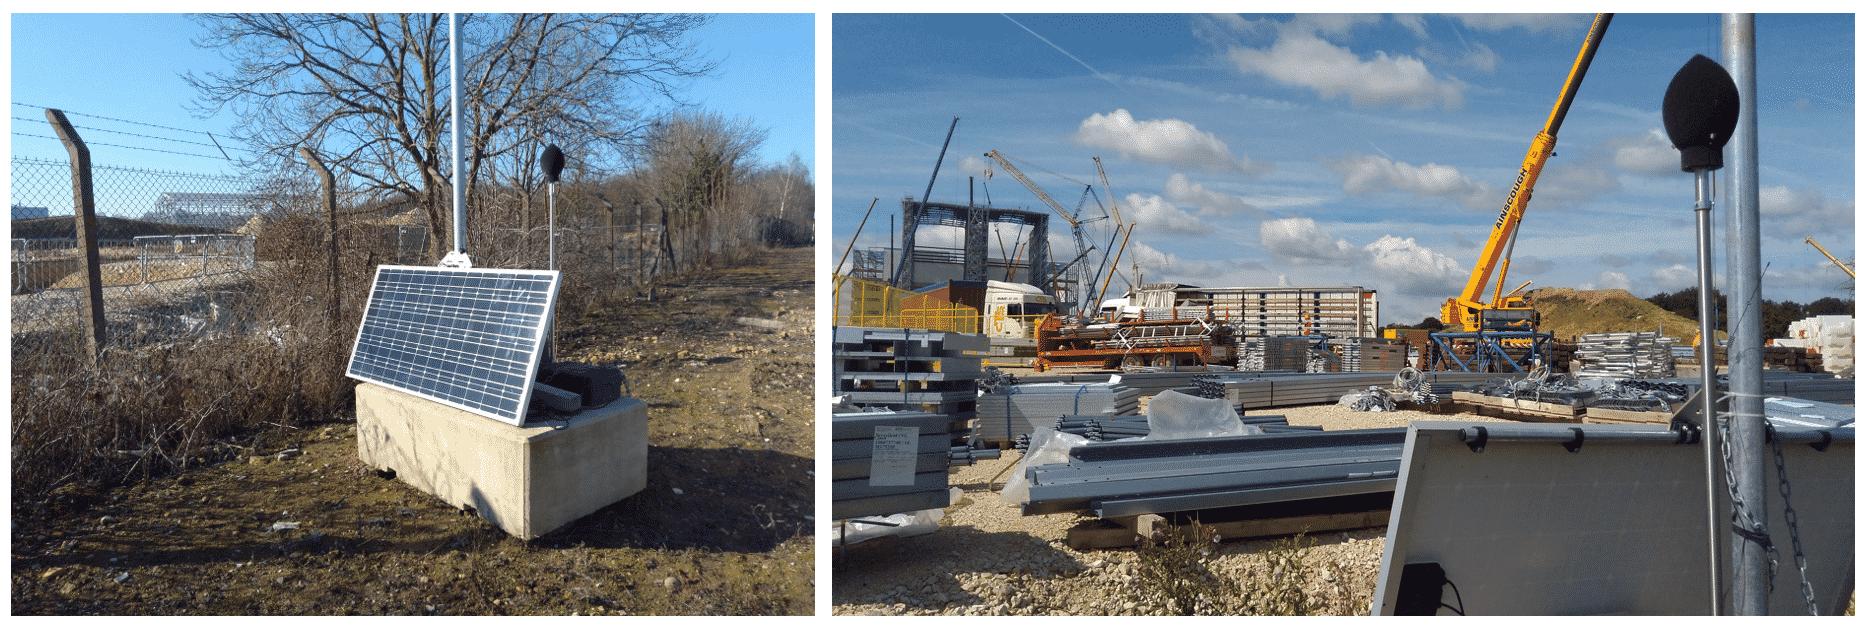 Construction noise monitoring